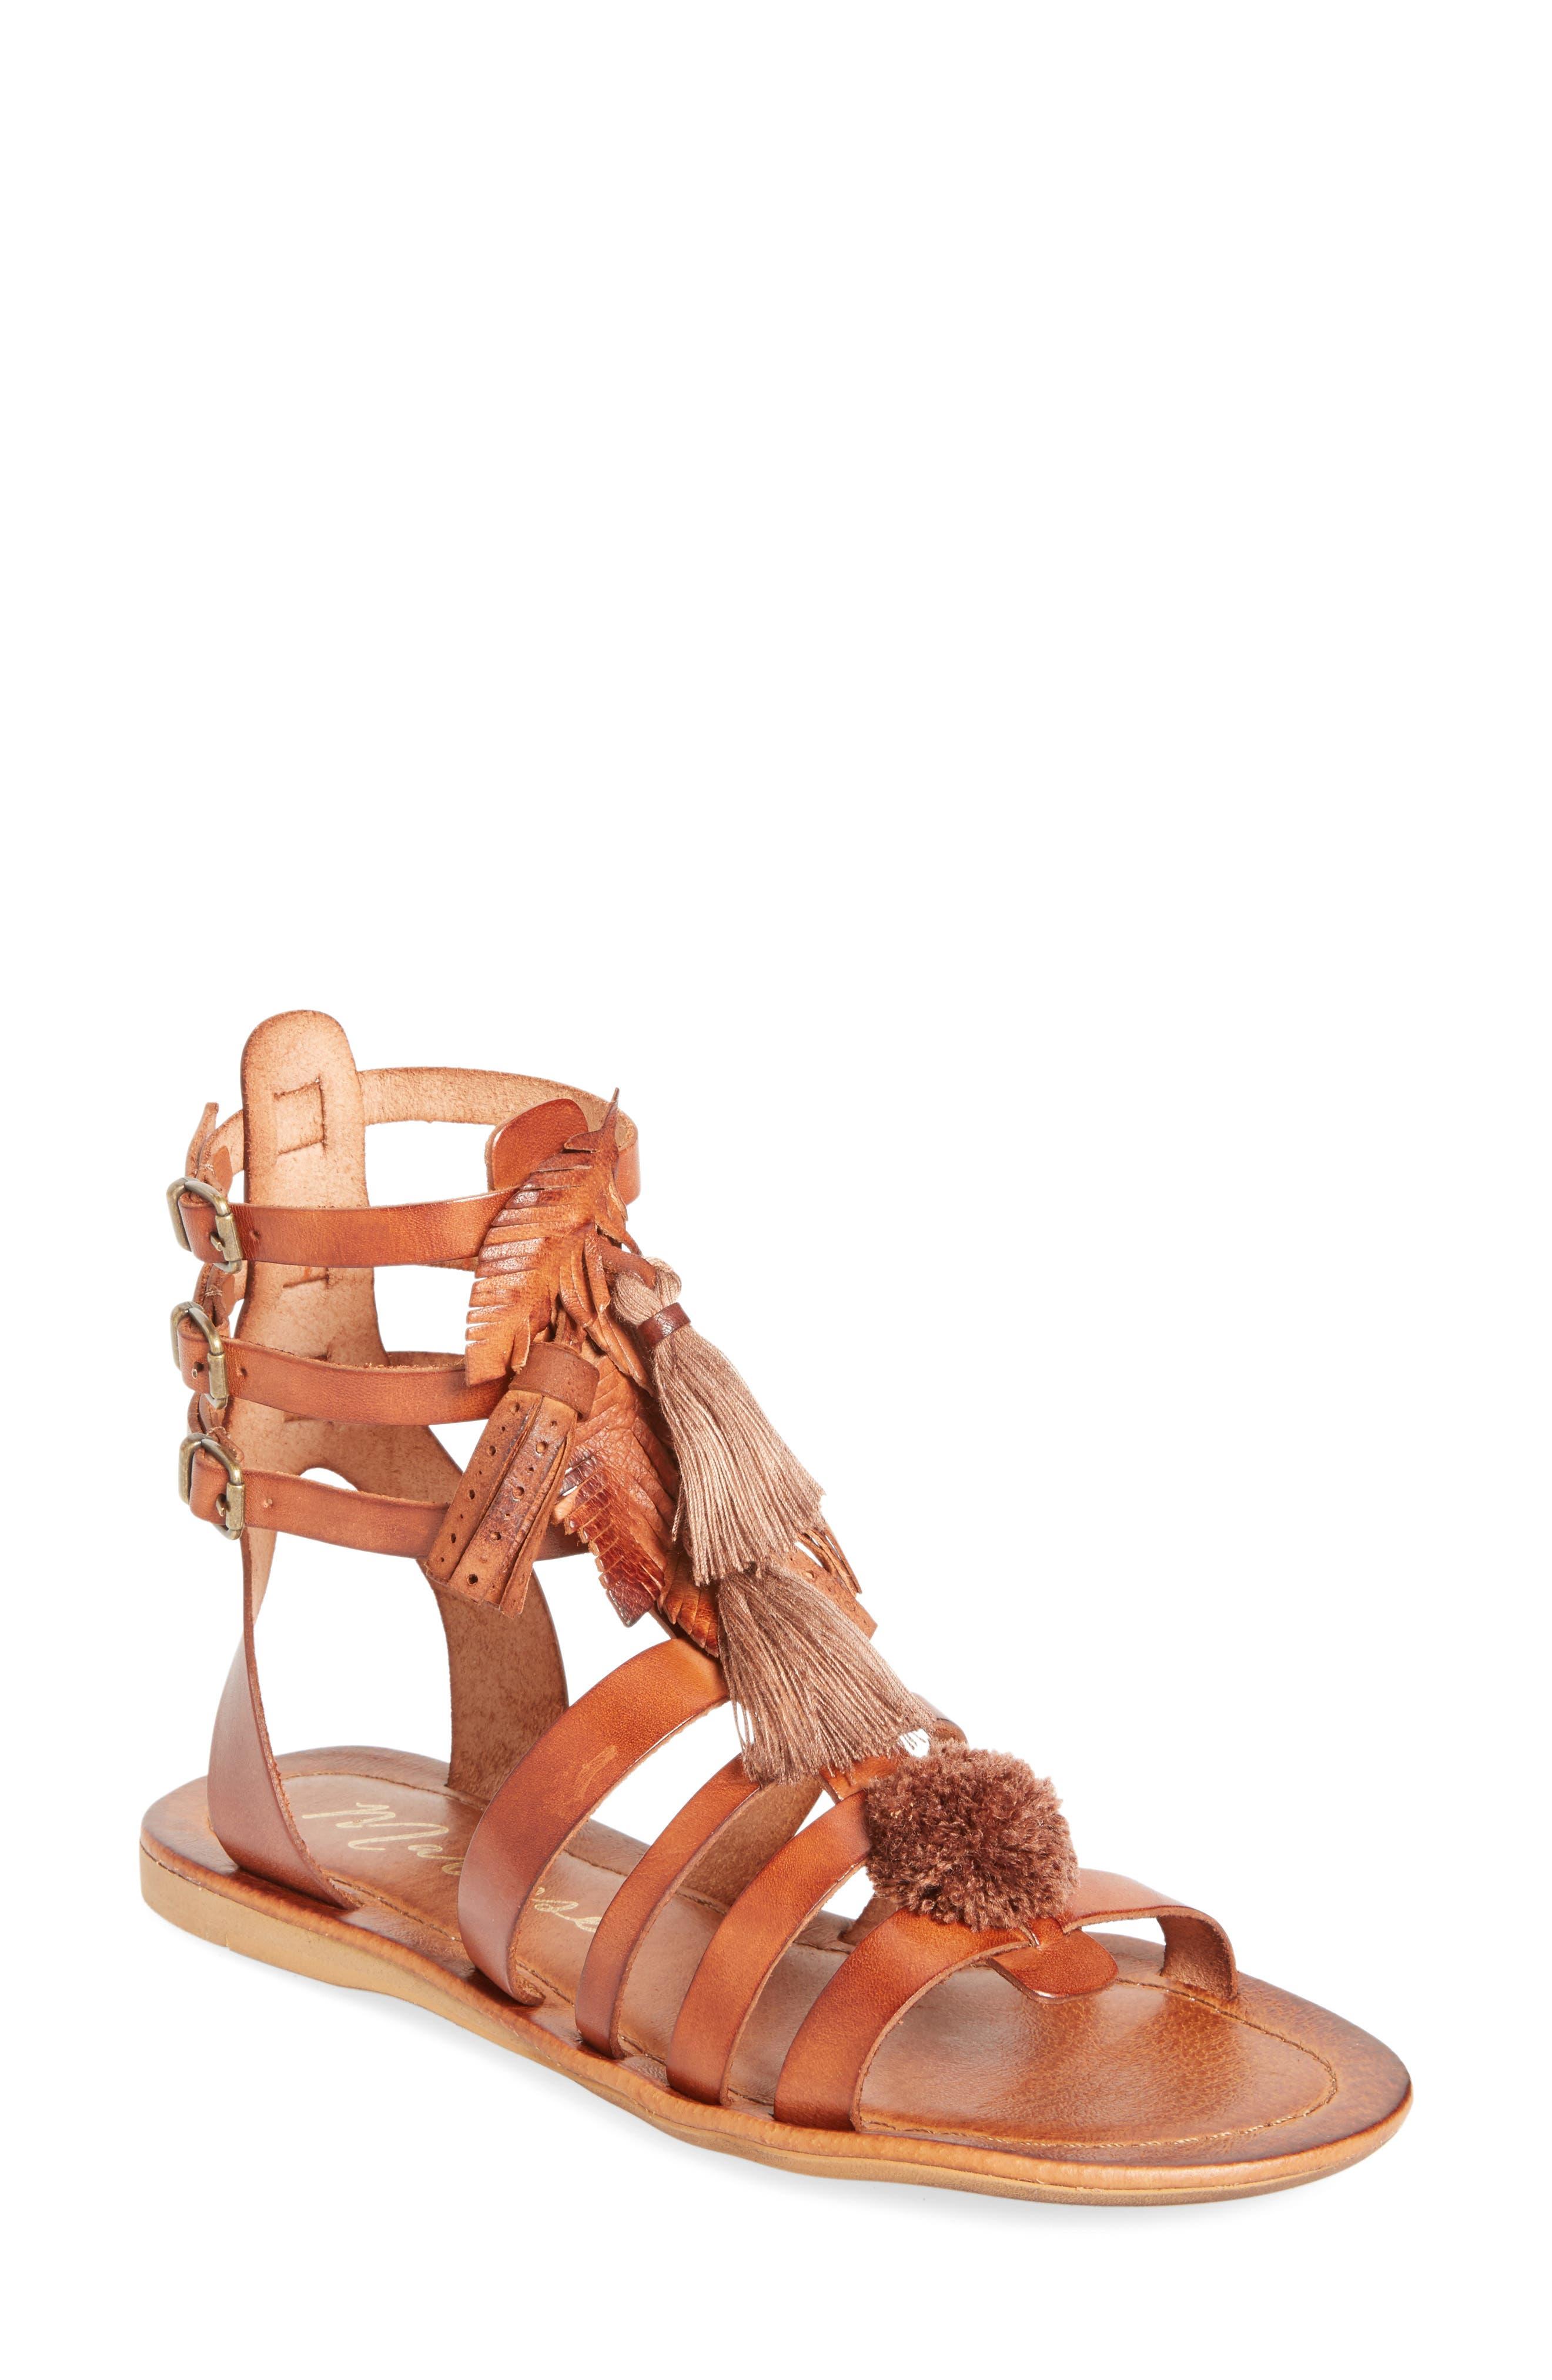 Alternate Image 1 Selected - Matisse Warrior Gladiator Sandal (Women)